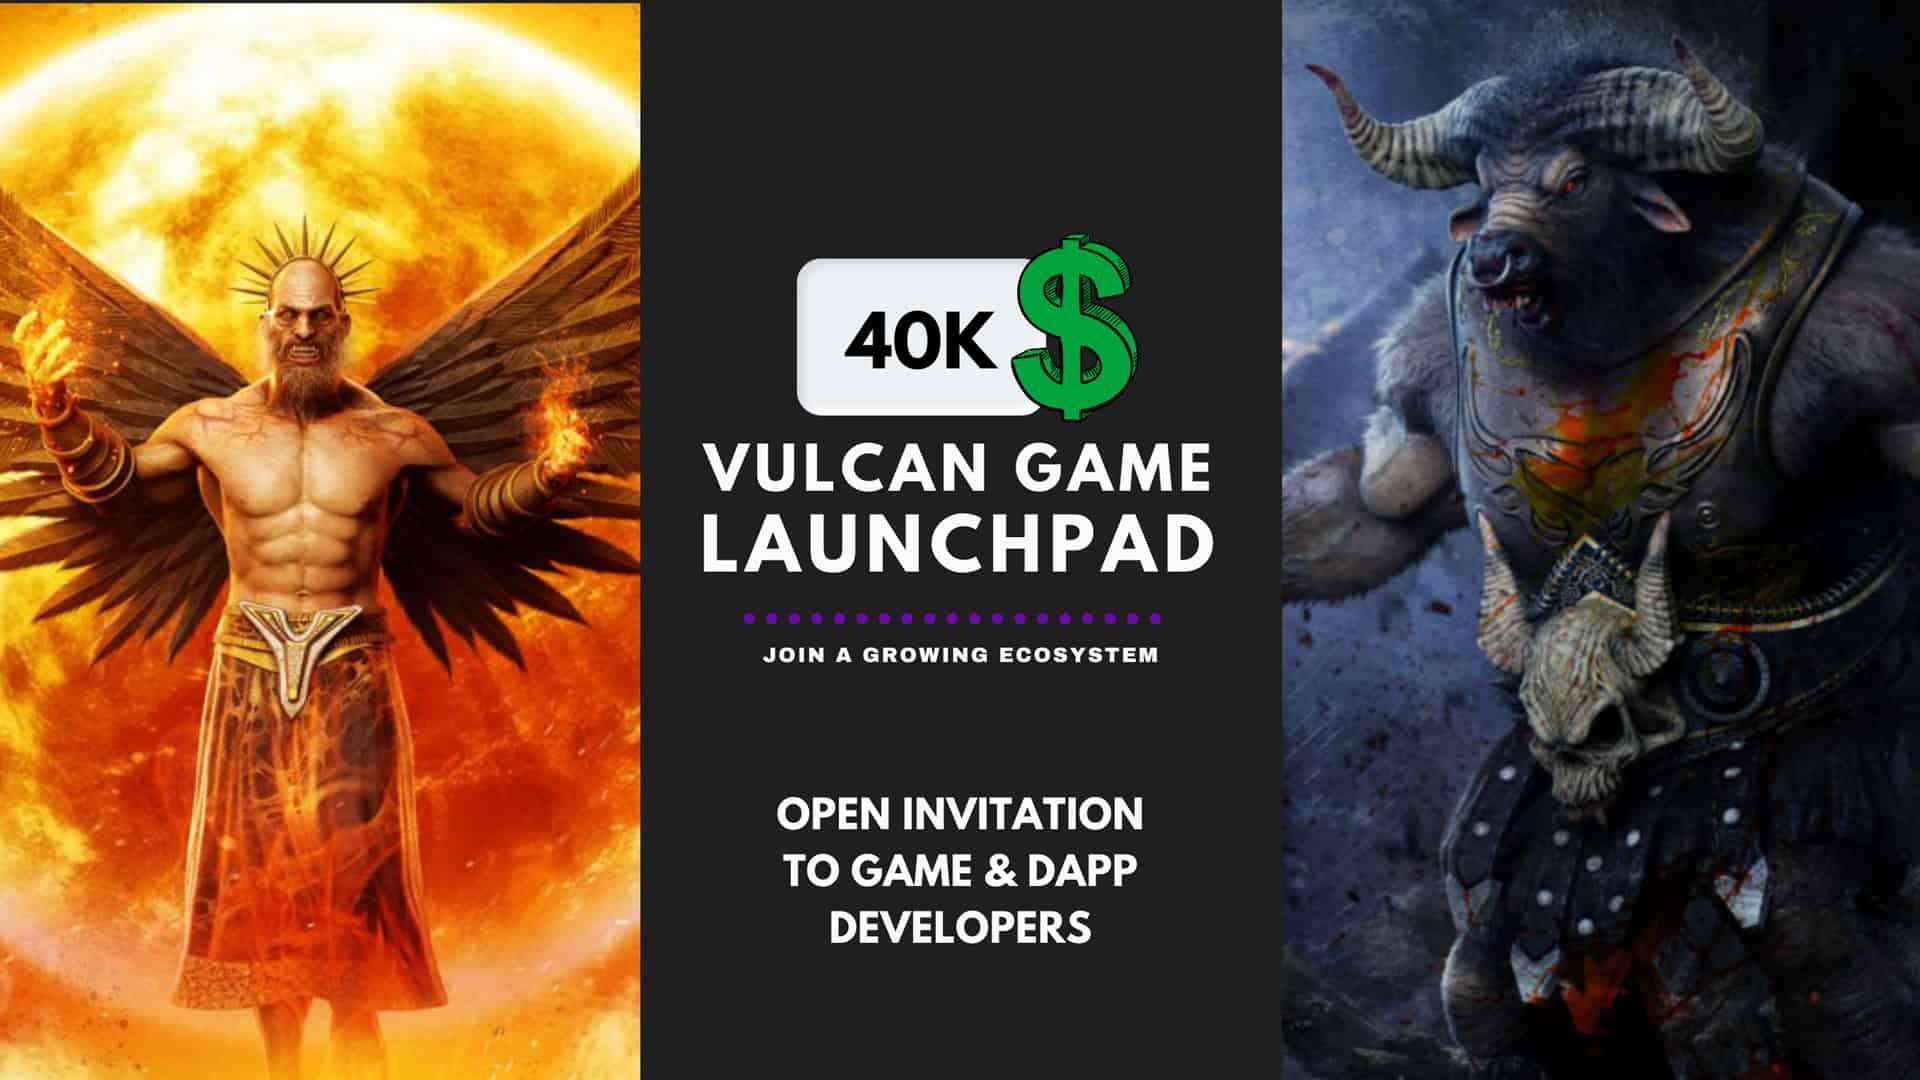 Vulcan Game Launchpad